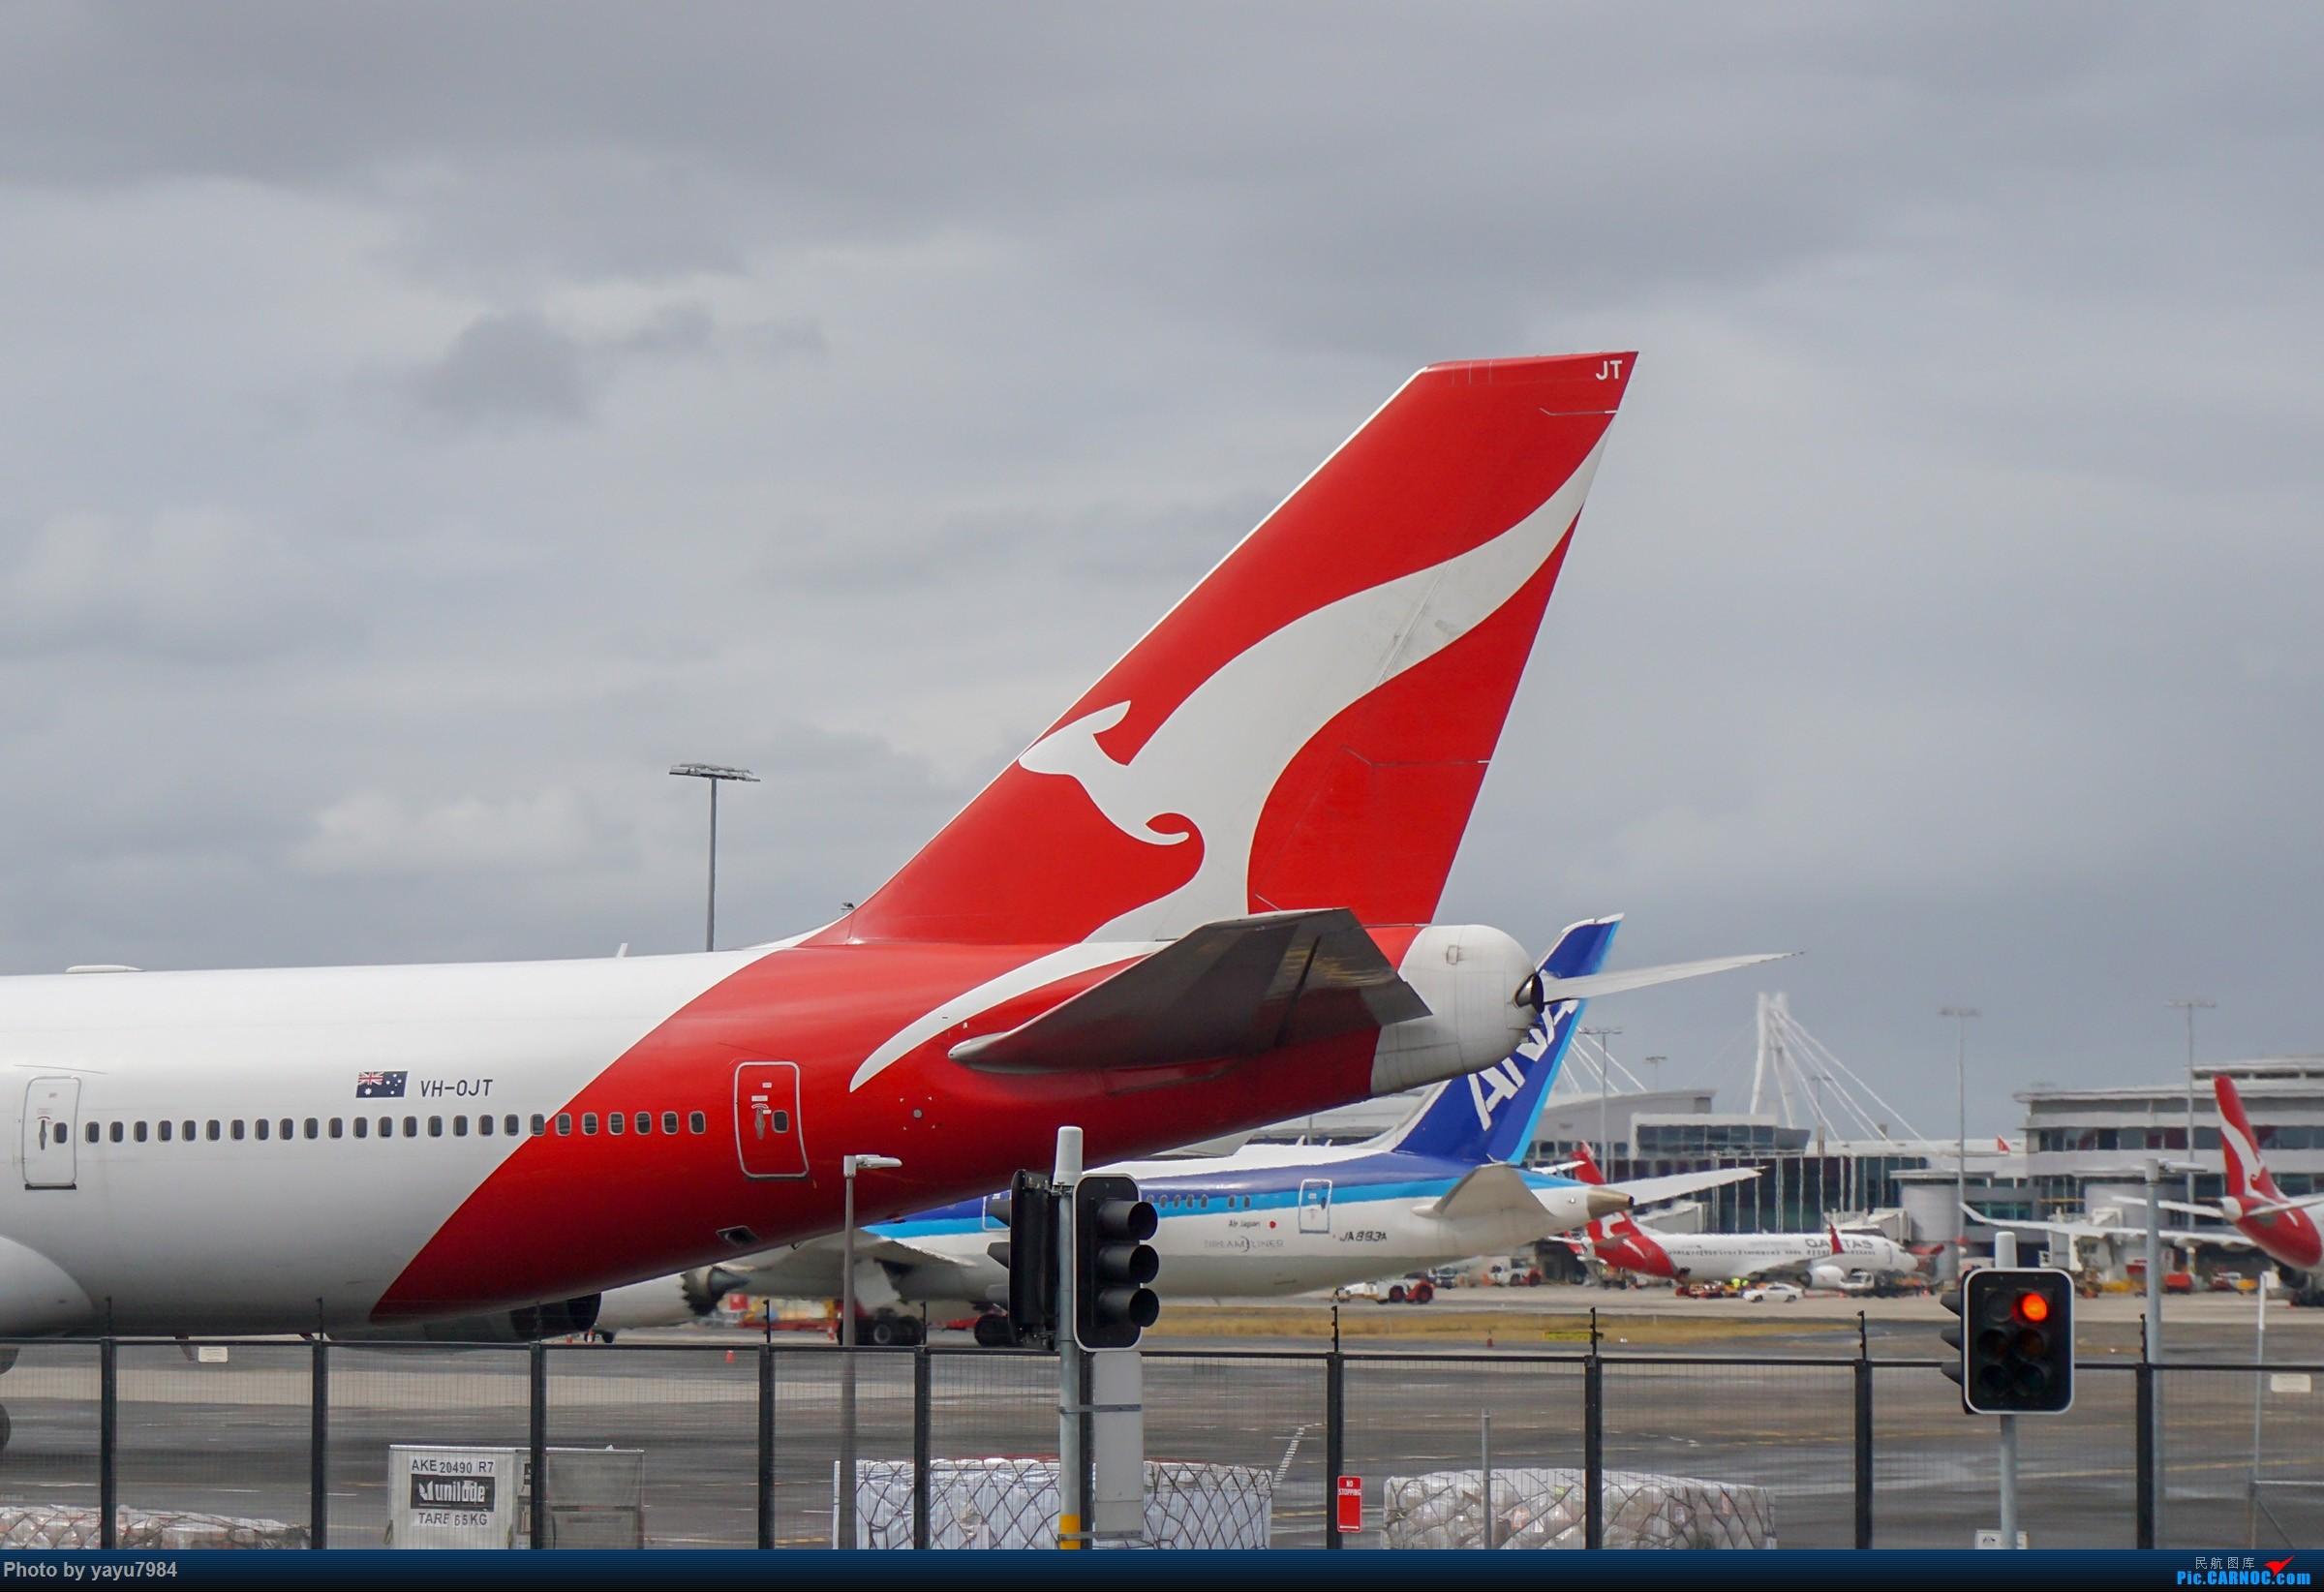 Re:[原创][SYD] 解锁几个没拍过的货:马航A359,RR引擎的袋鼠744... BOEING 747-400 VH-OJT 澳大利亚悉尼金斯福德・史密斯机场